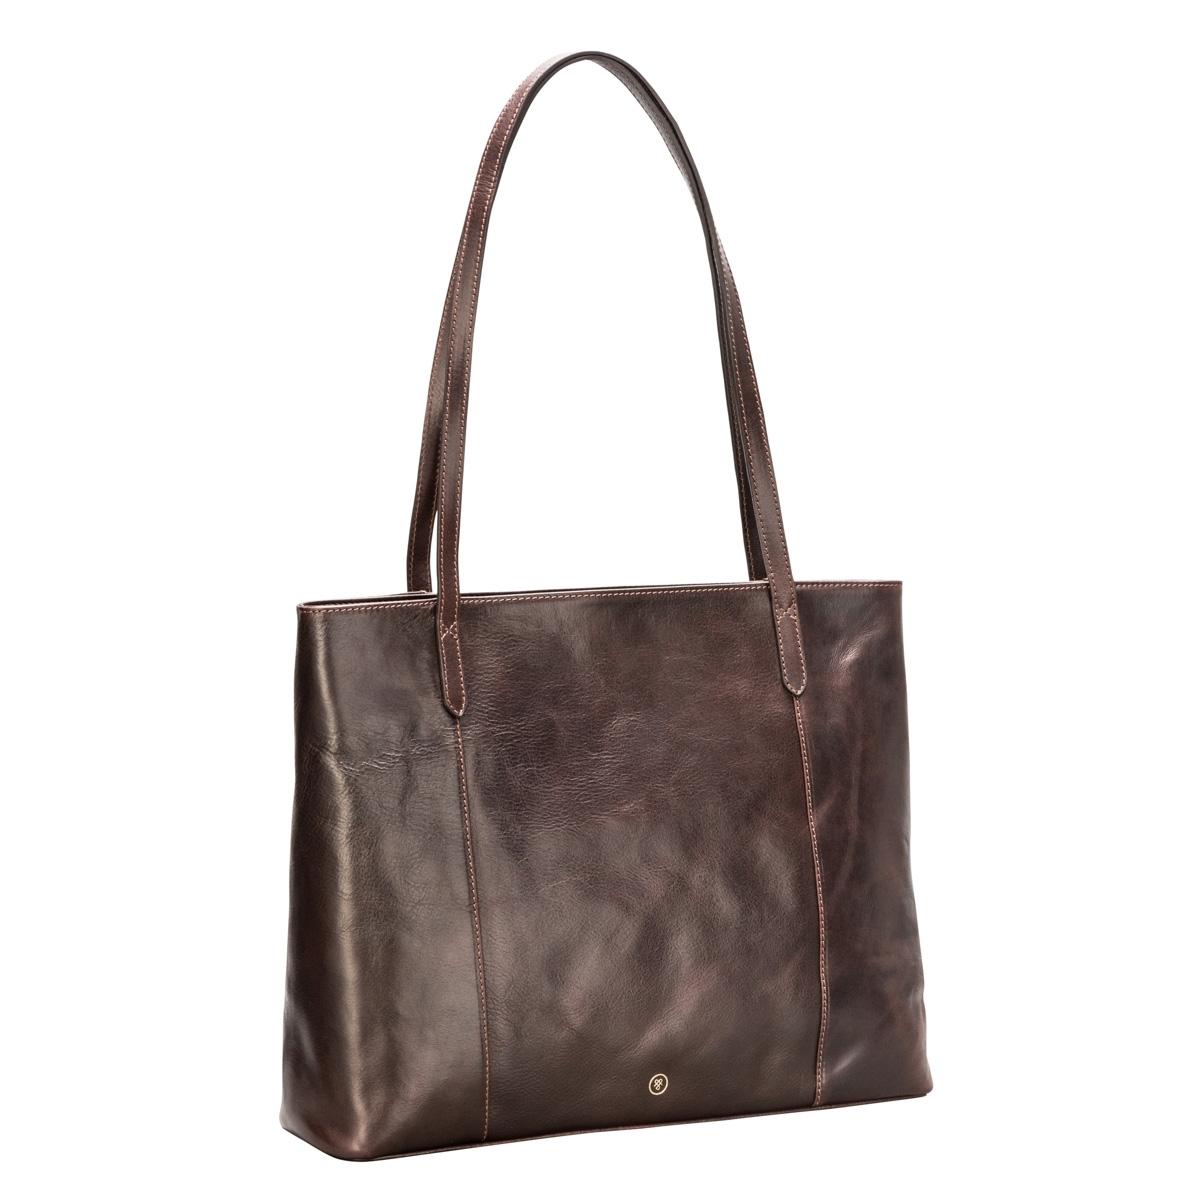 MAXWELL SCOTT BAGS Italian Leather Brown Shopper Tote For Women